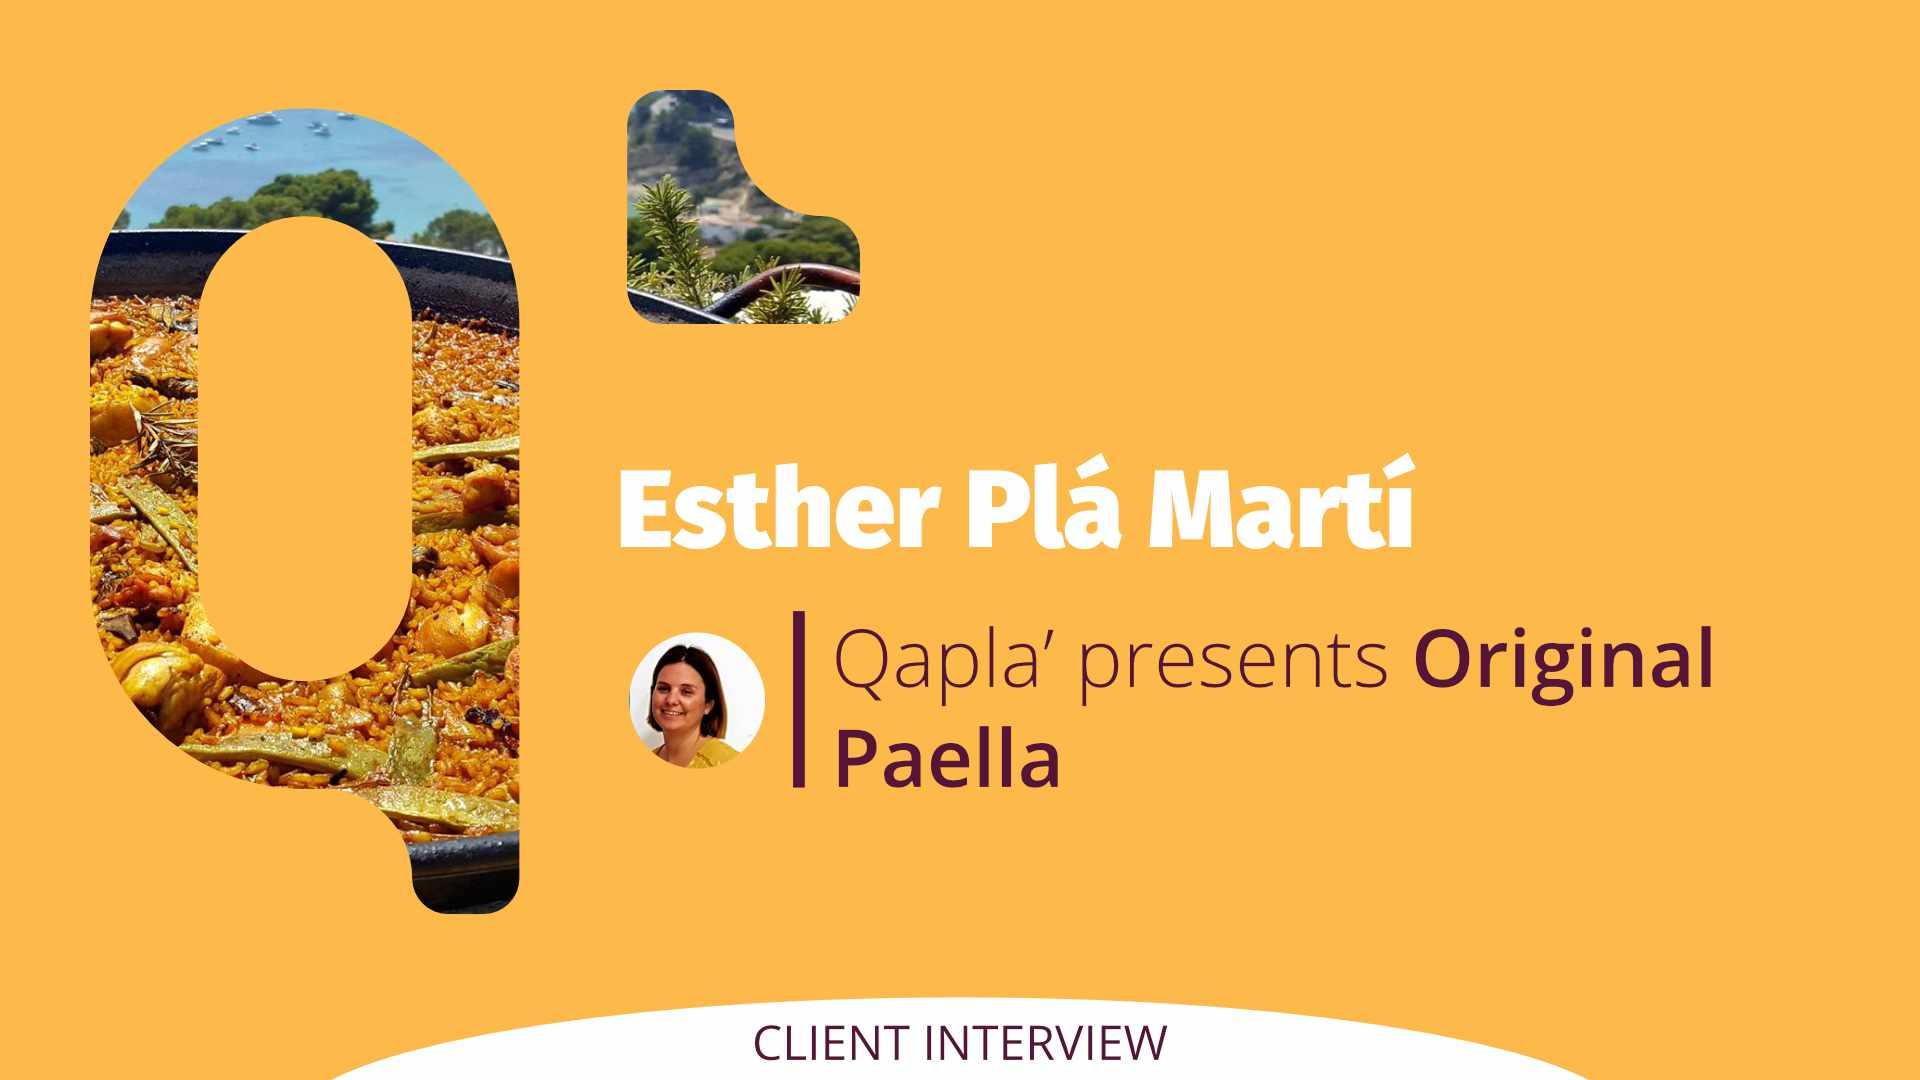 Qapla' presents Original Paella: Interview to Esther Plá Martí